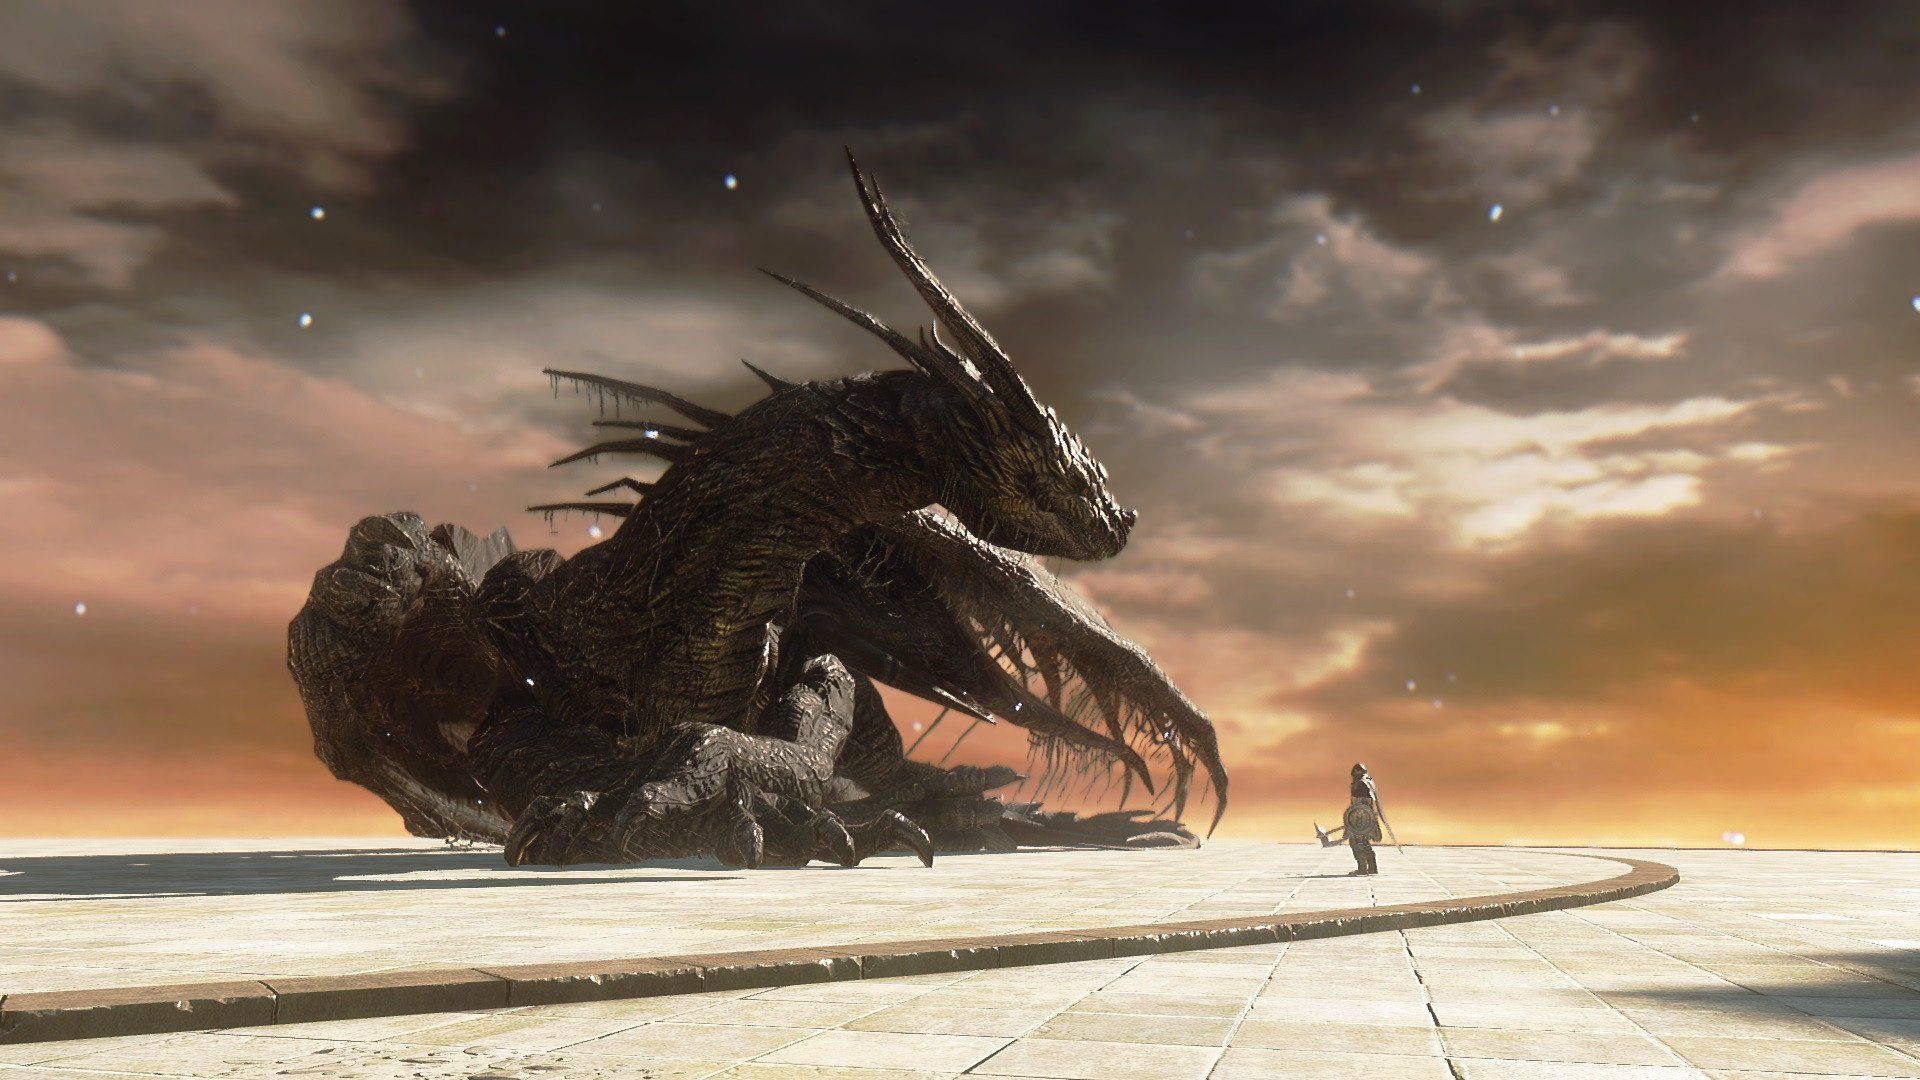 Dark Souls 2 Wallpaper: Dark Souls II HD Wallpaper